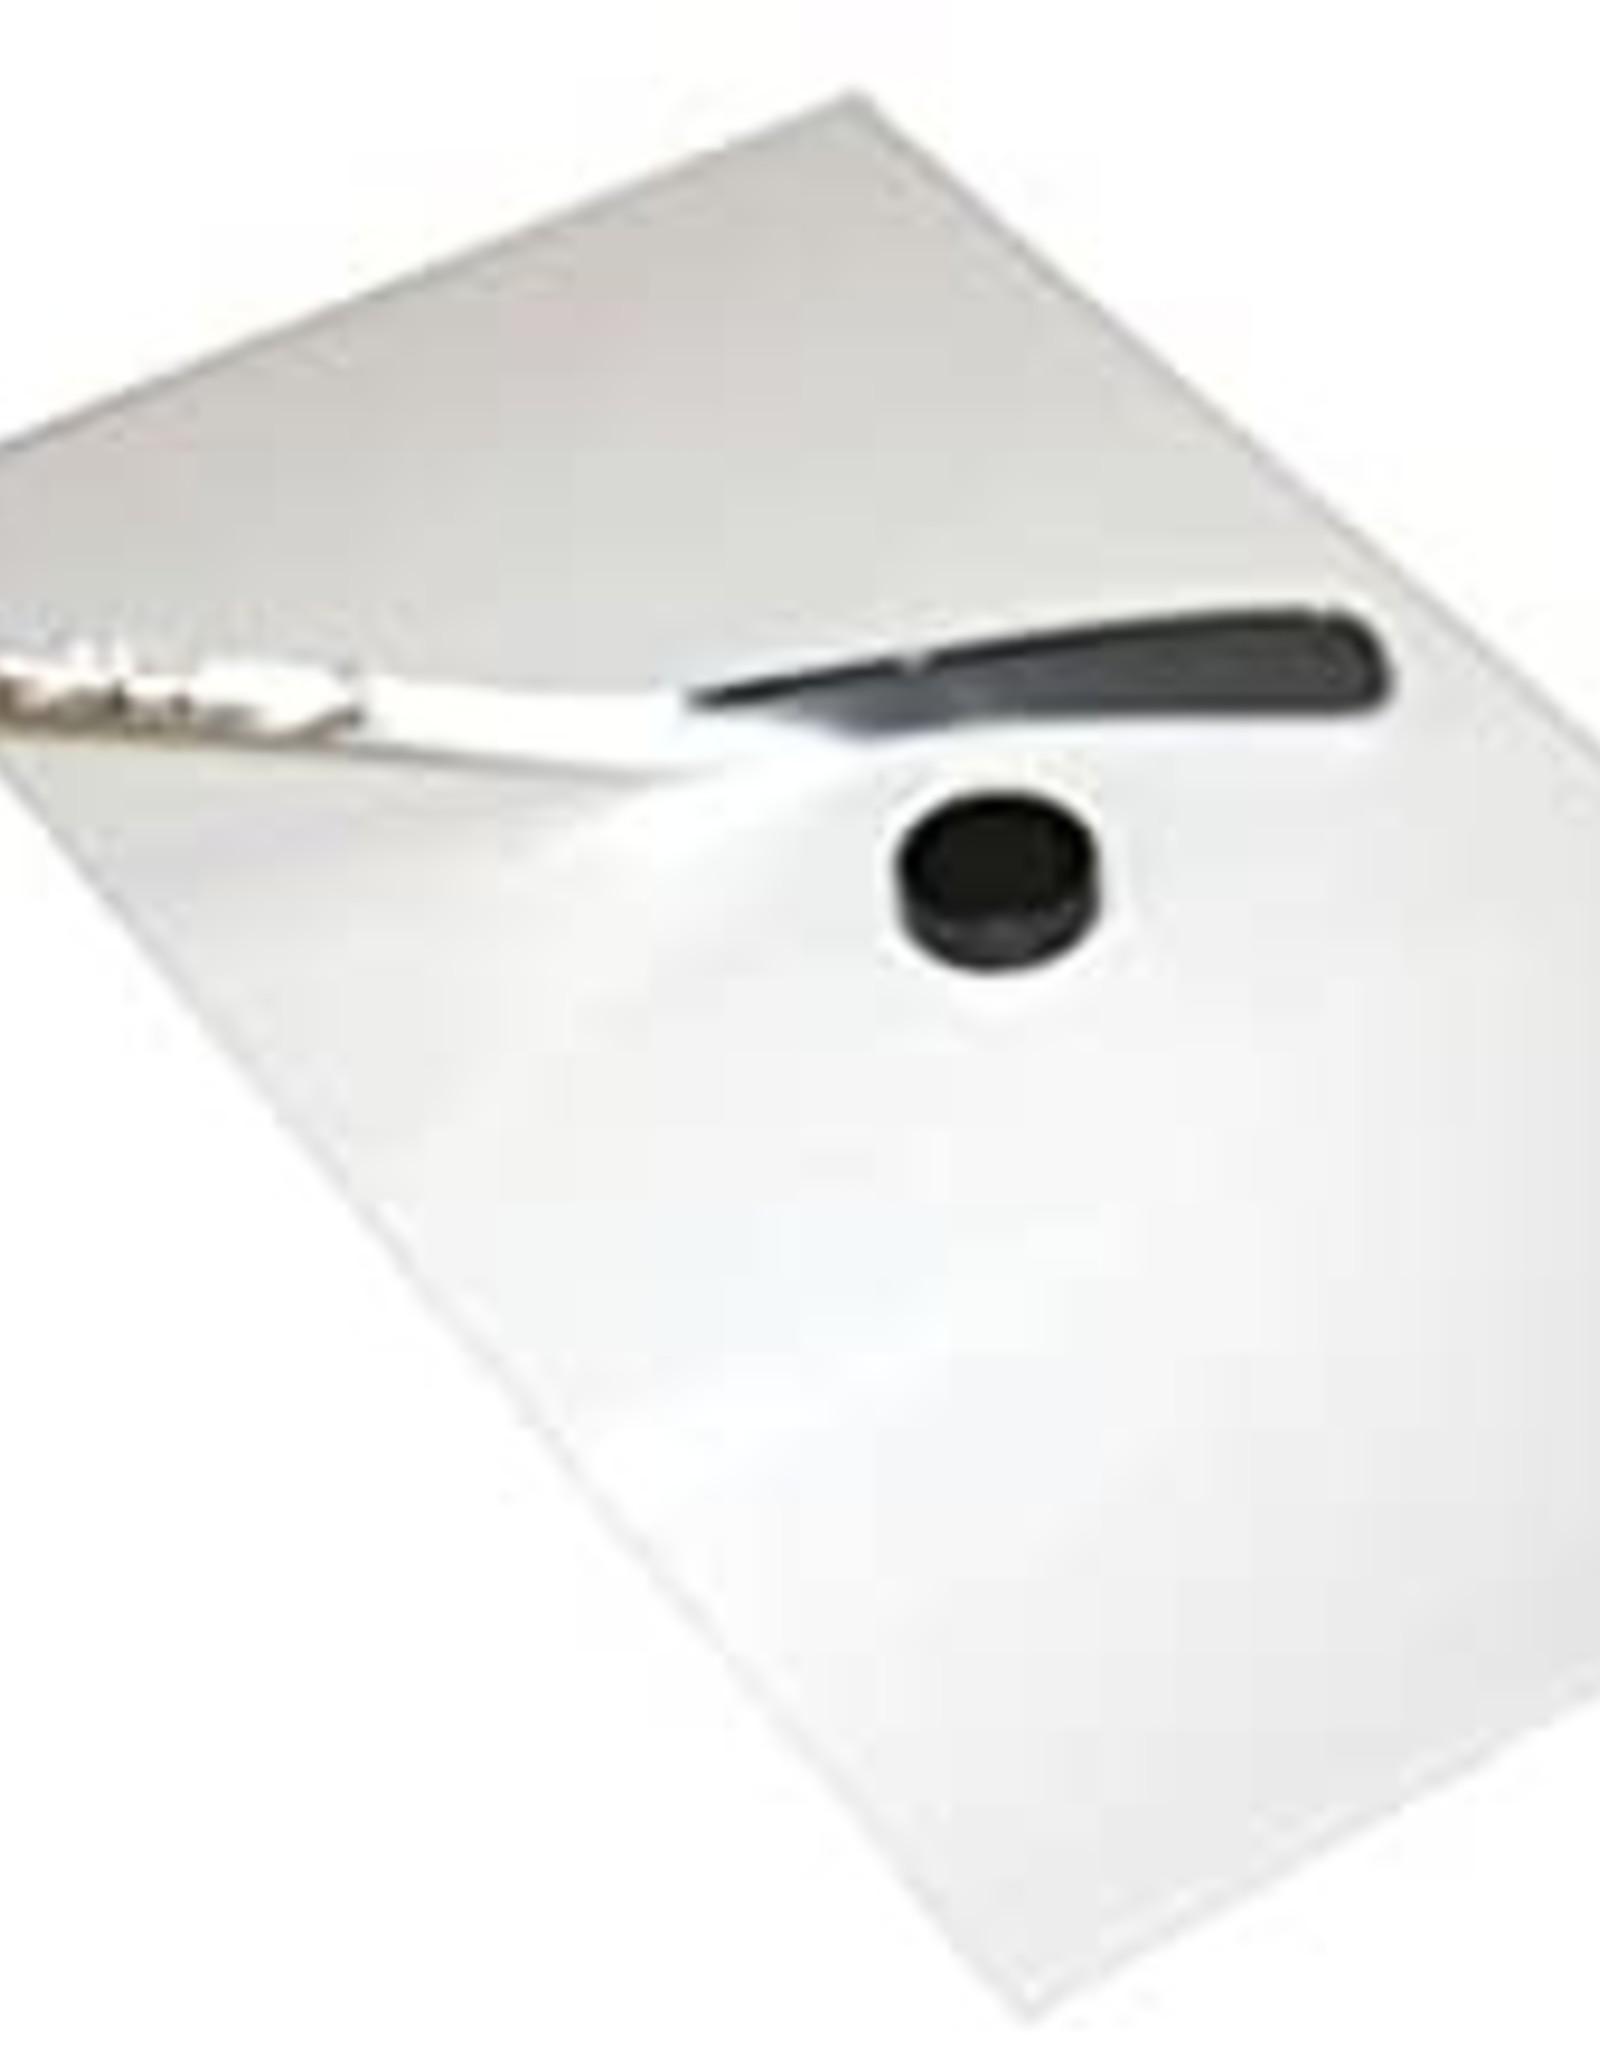 BLUESPORTS Simulated Ice Board XXL 120-100